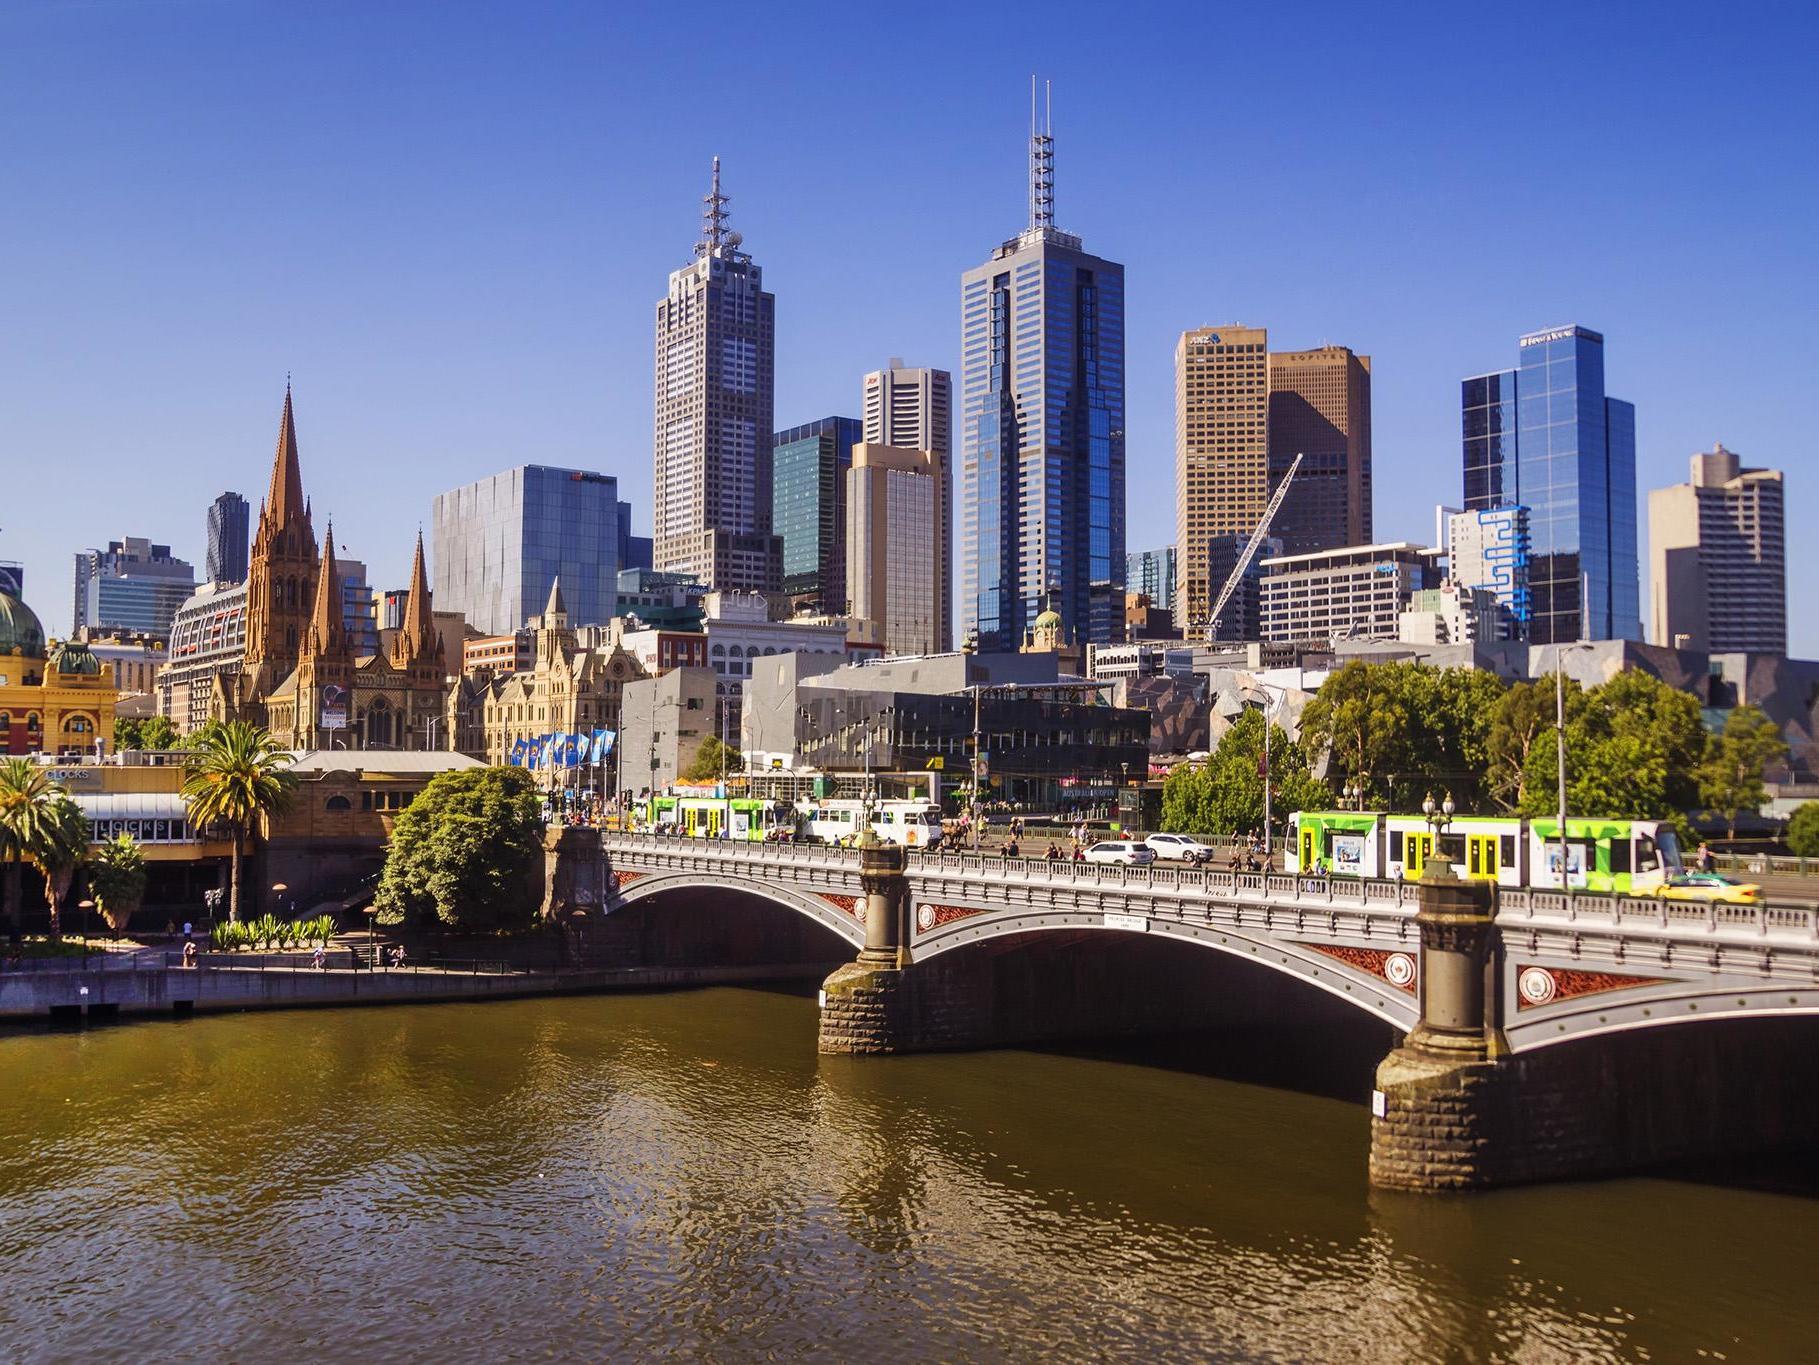 17. Melbourne, Australia